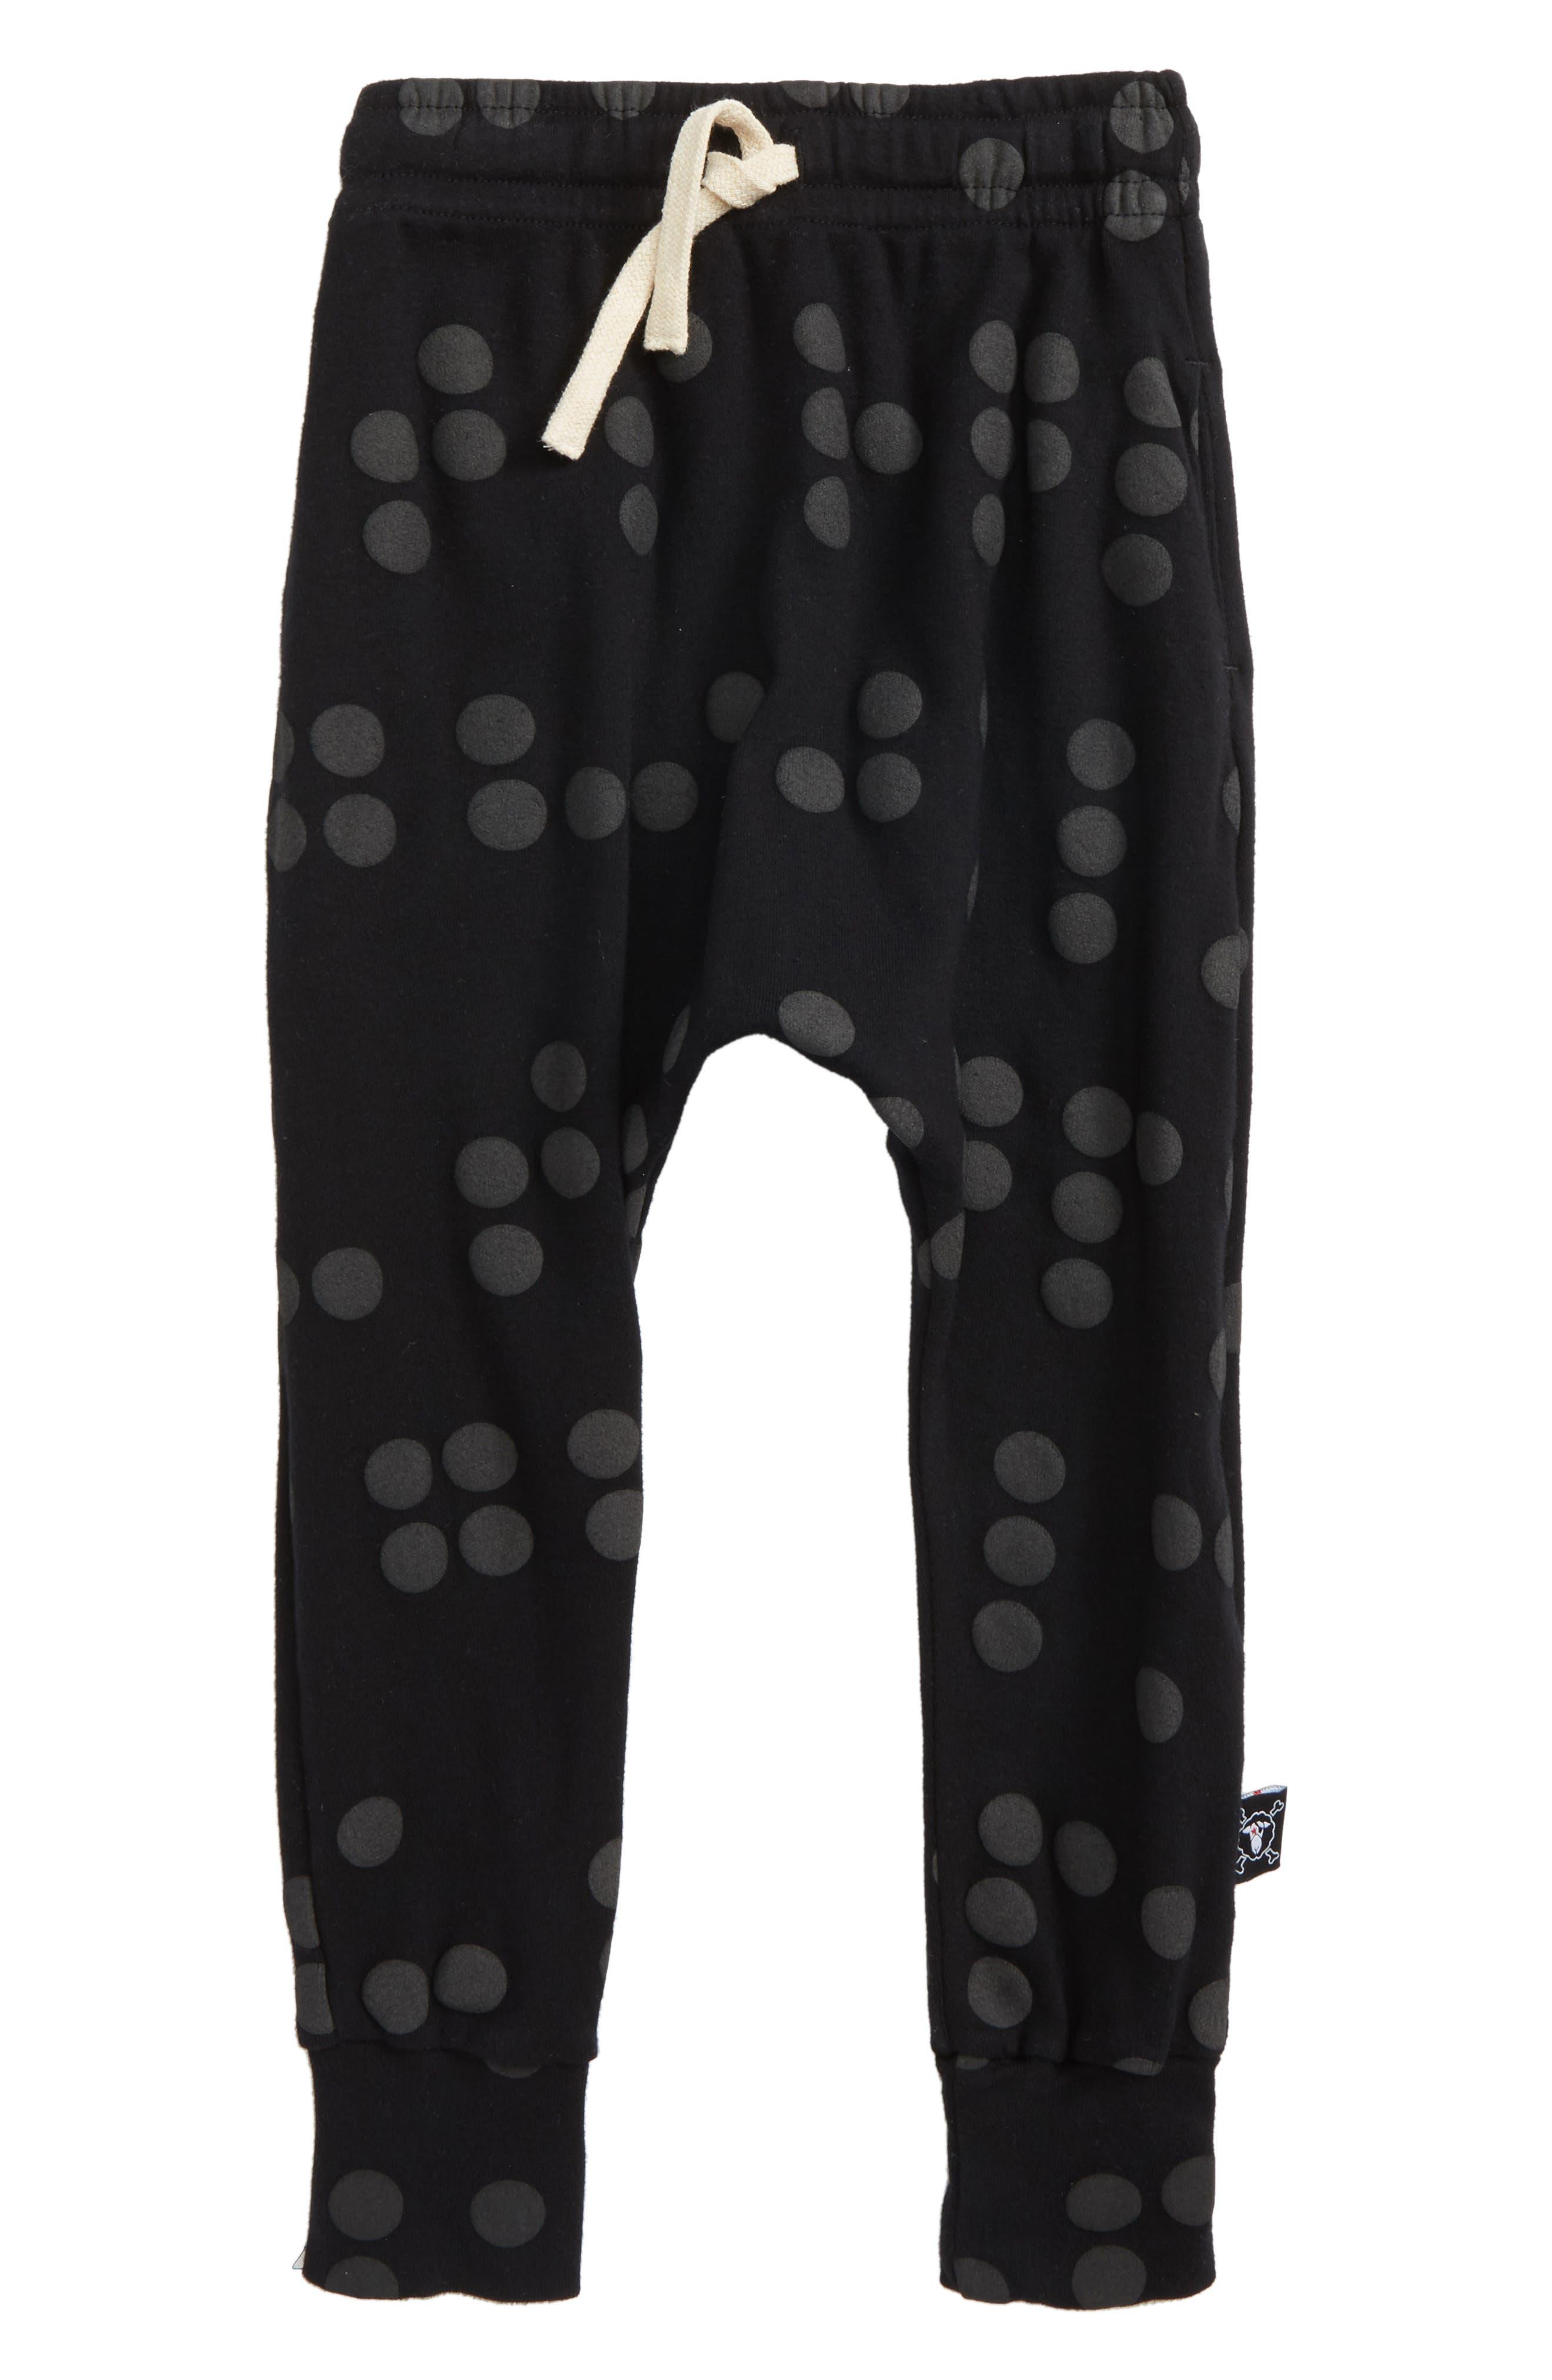 Braille Jogger Pants,                             Main thumbnail 1, color,                             Black